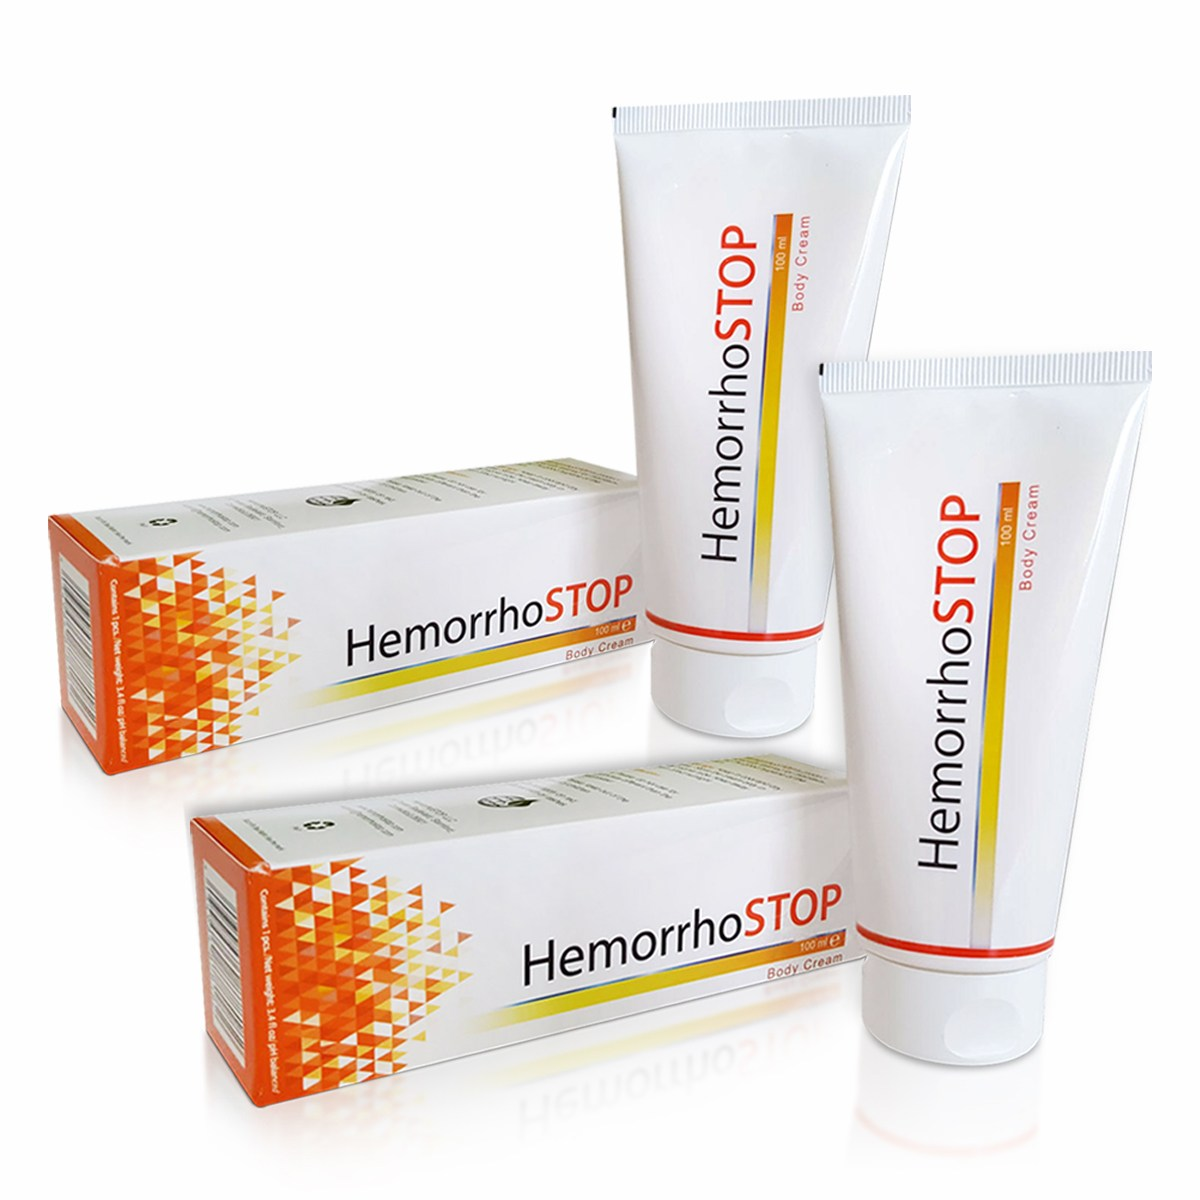 Hemorrhostop Cream - ดีไหม - คืออะไร - วิธีใช้ - review